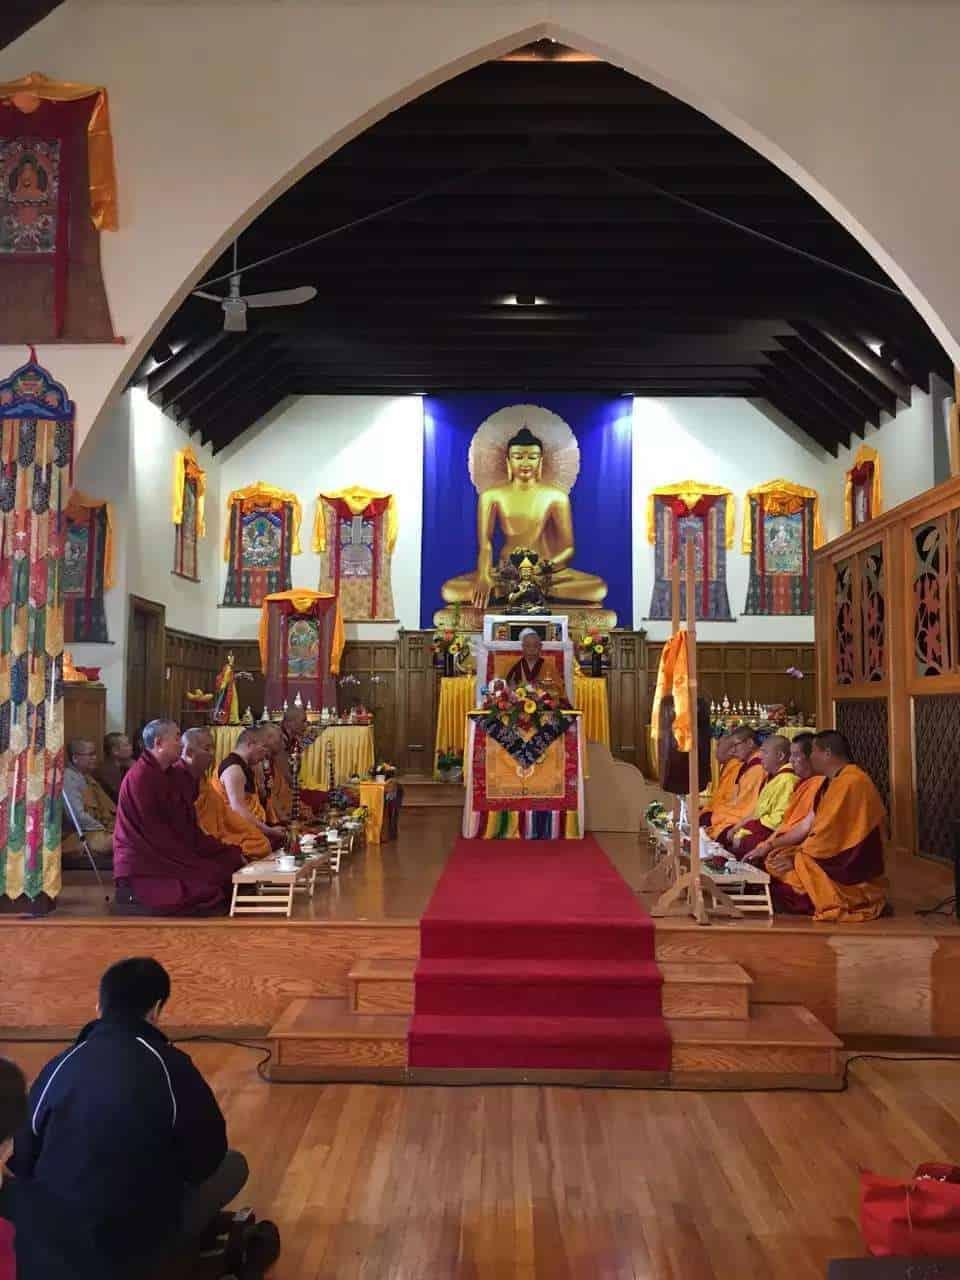 gosok-rinpoche-toronto-2016-712d947d005c4674b6f59aa05924189